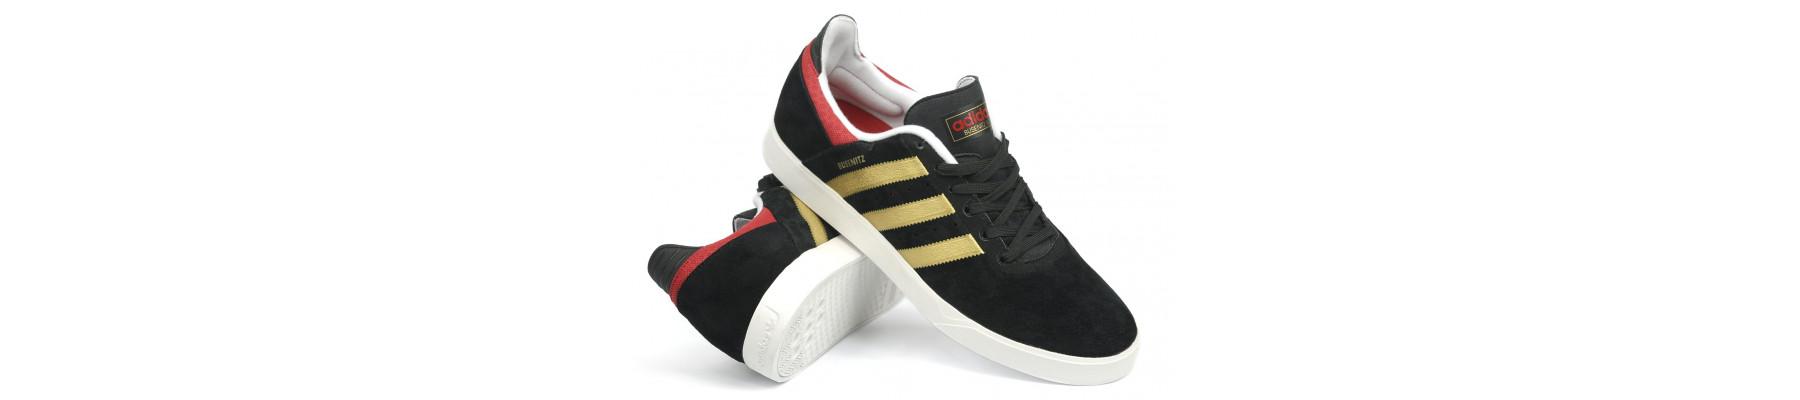 Adidas Skateboarding Busentz ADV Black